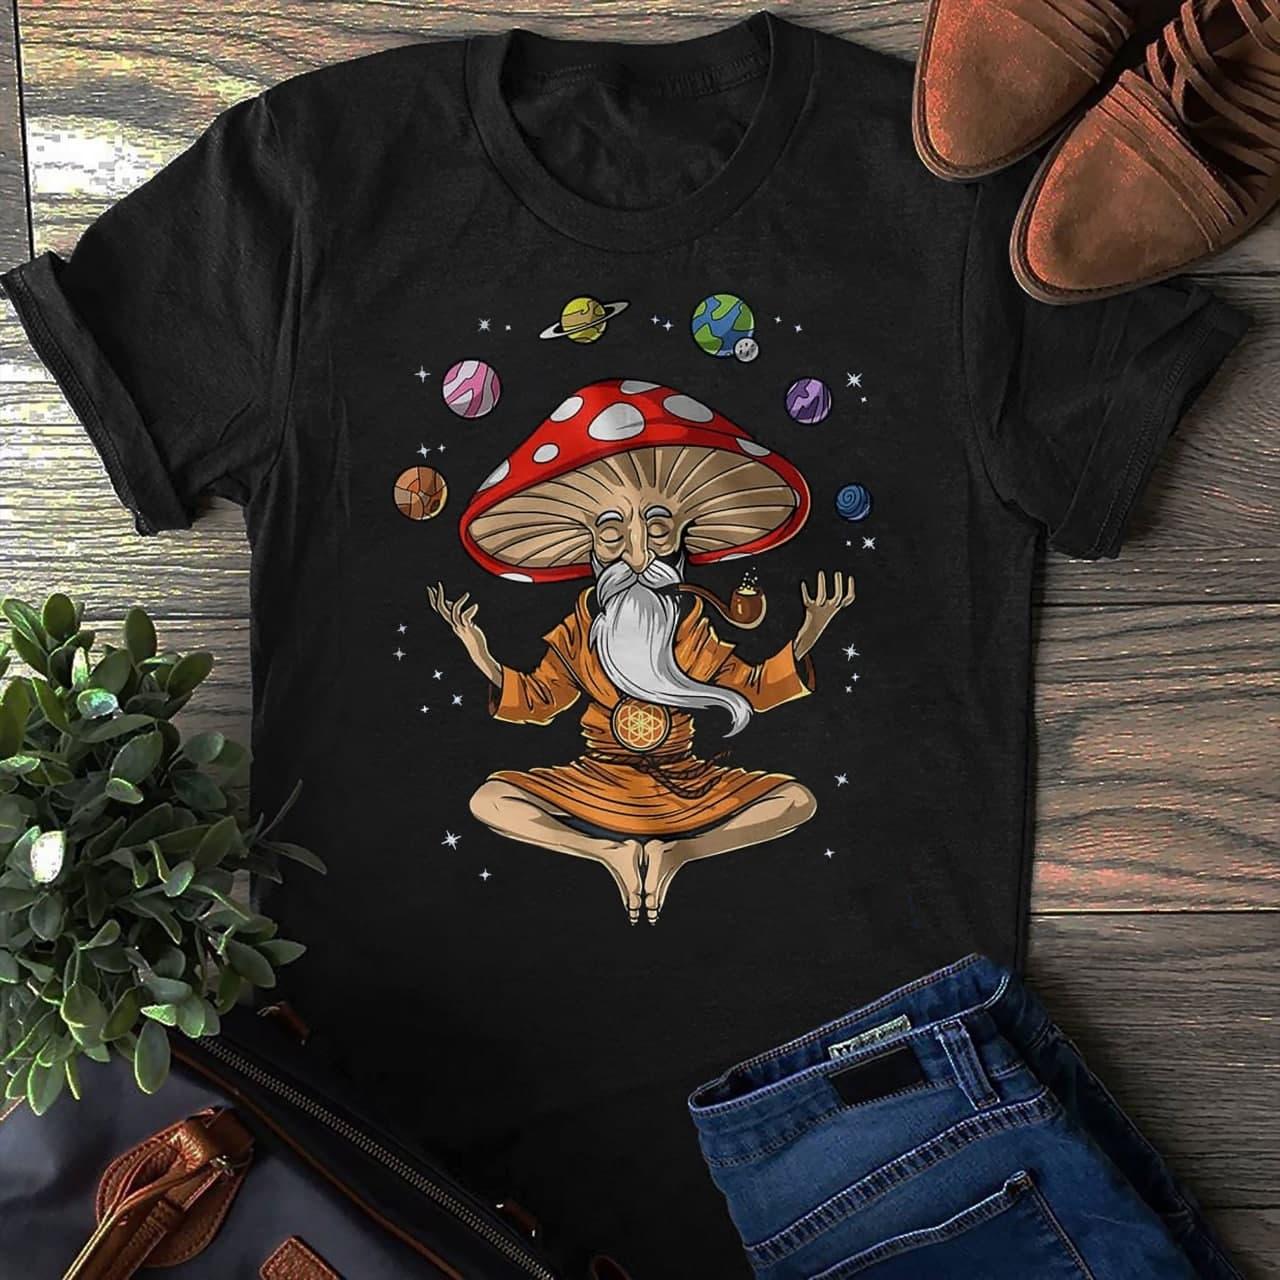 Yoga Shirt Magic Mushroom Mediation